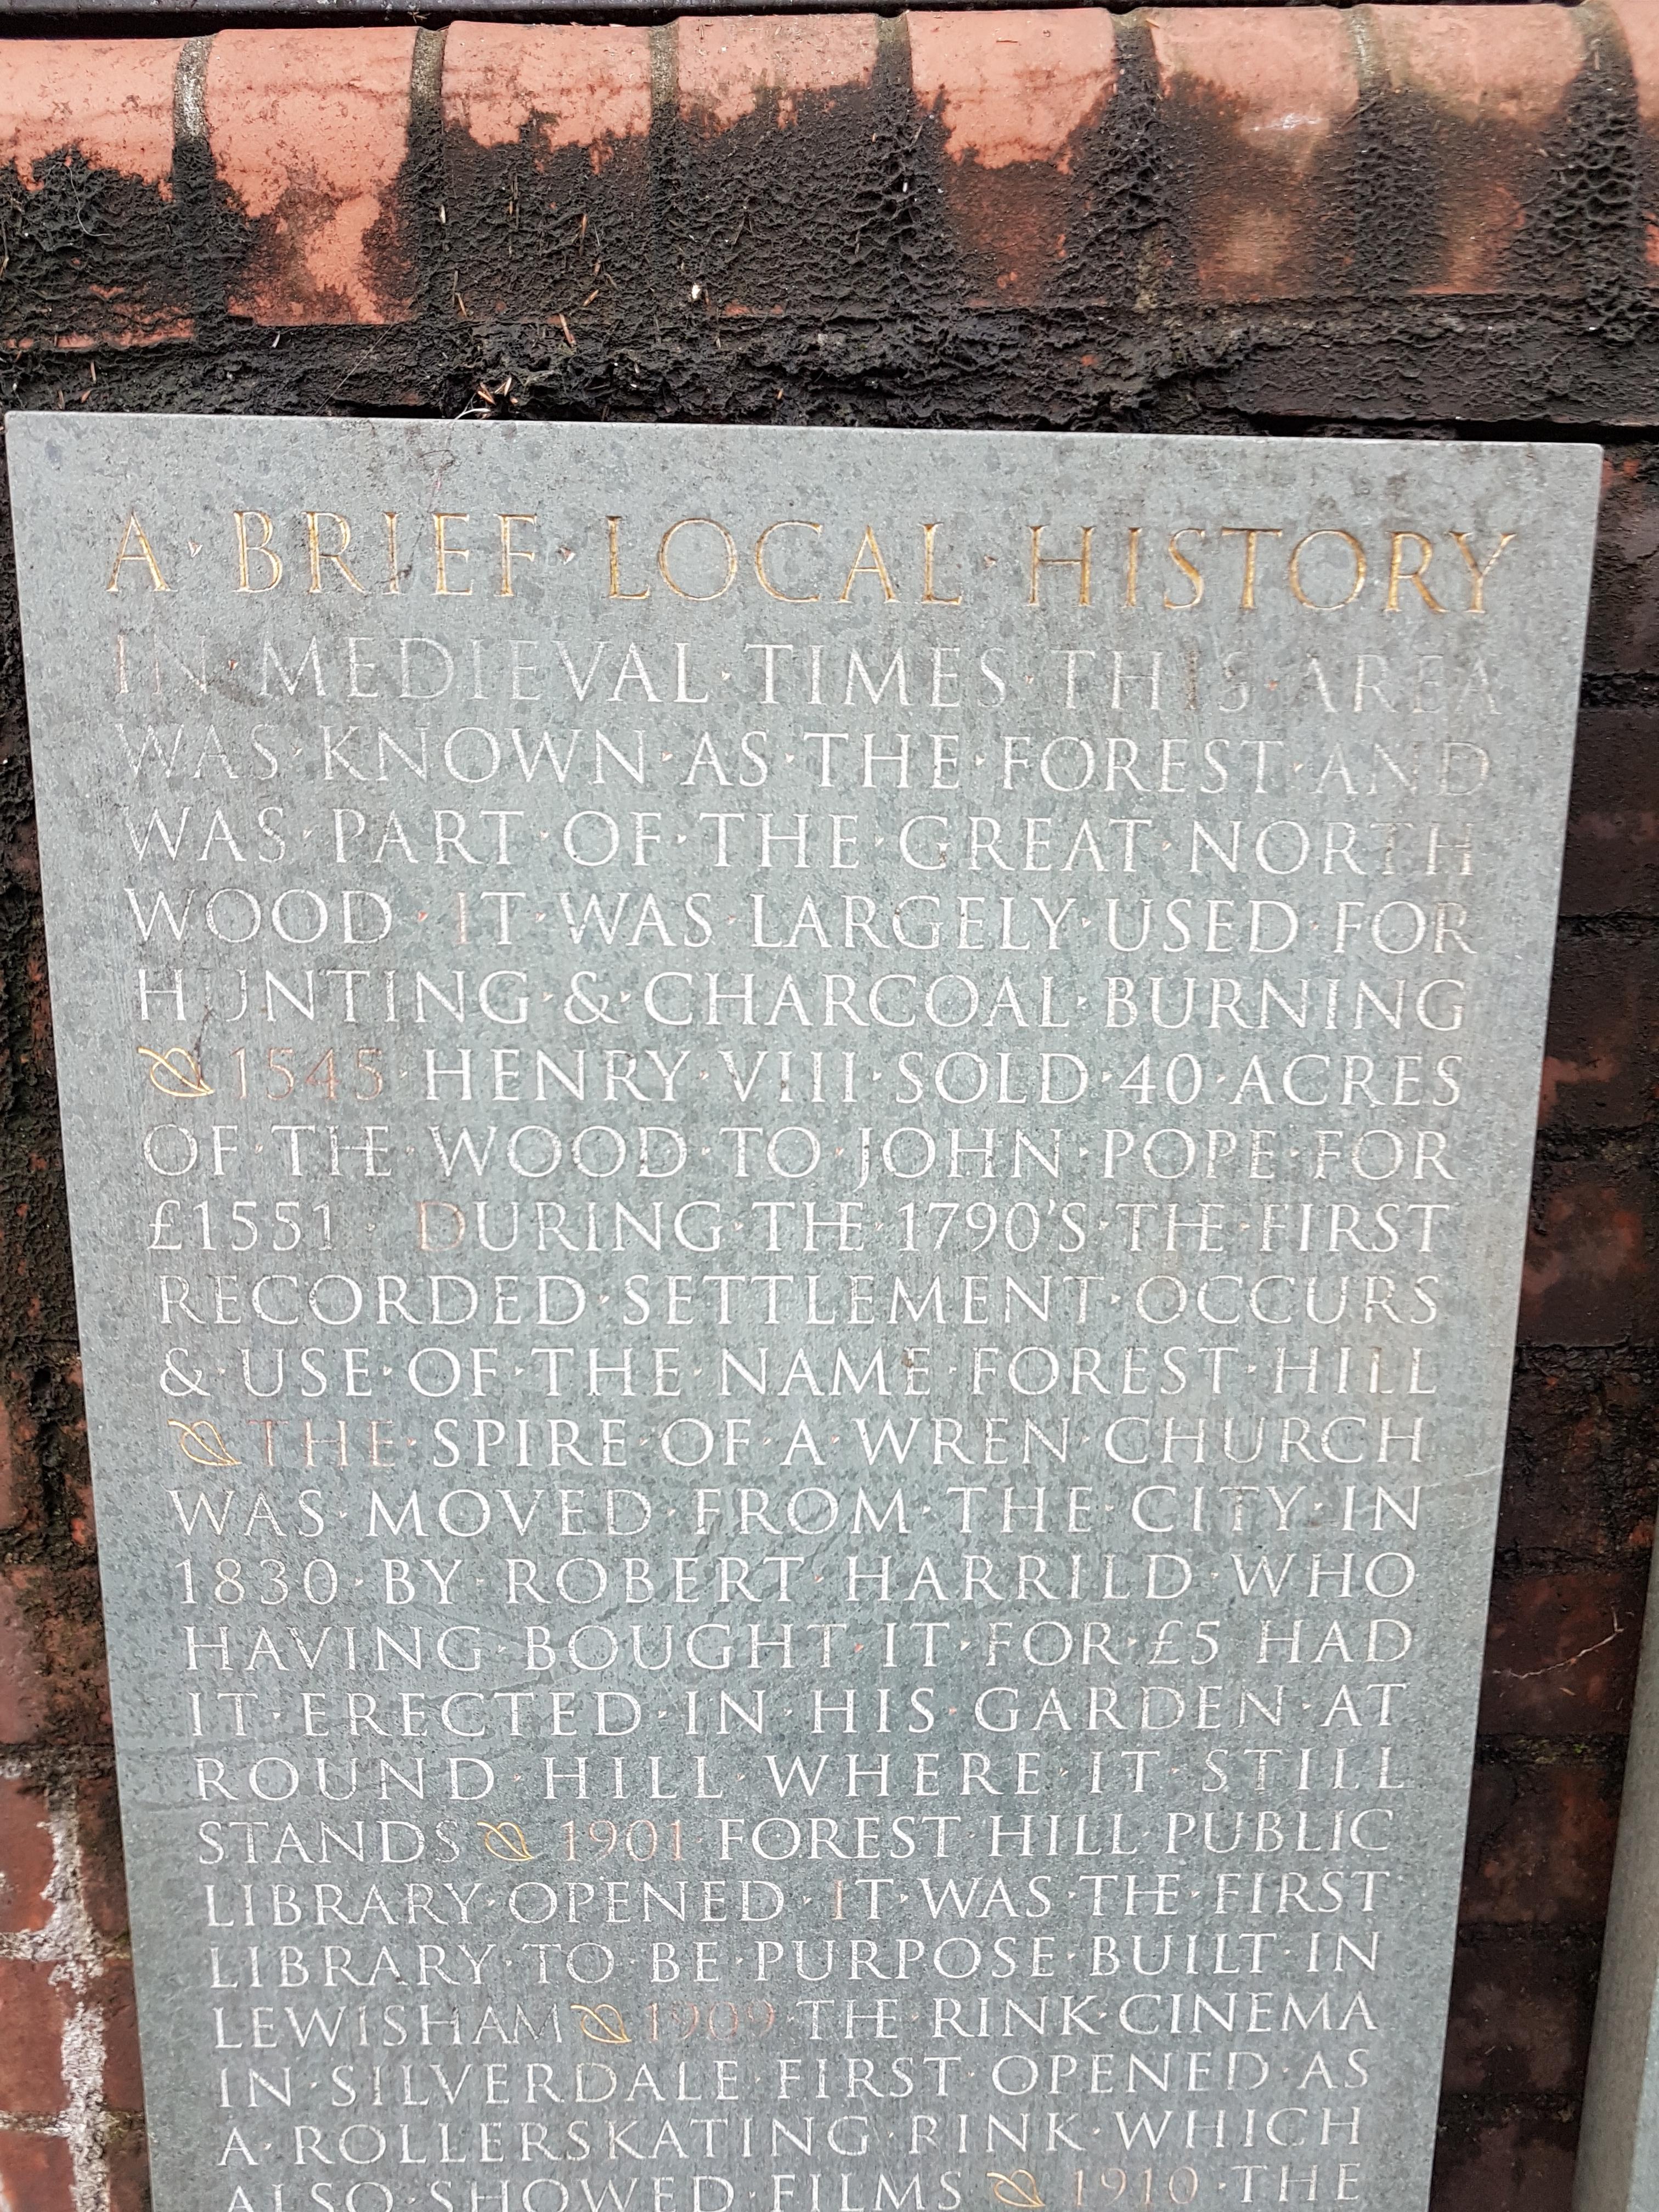 Brief Local History